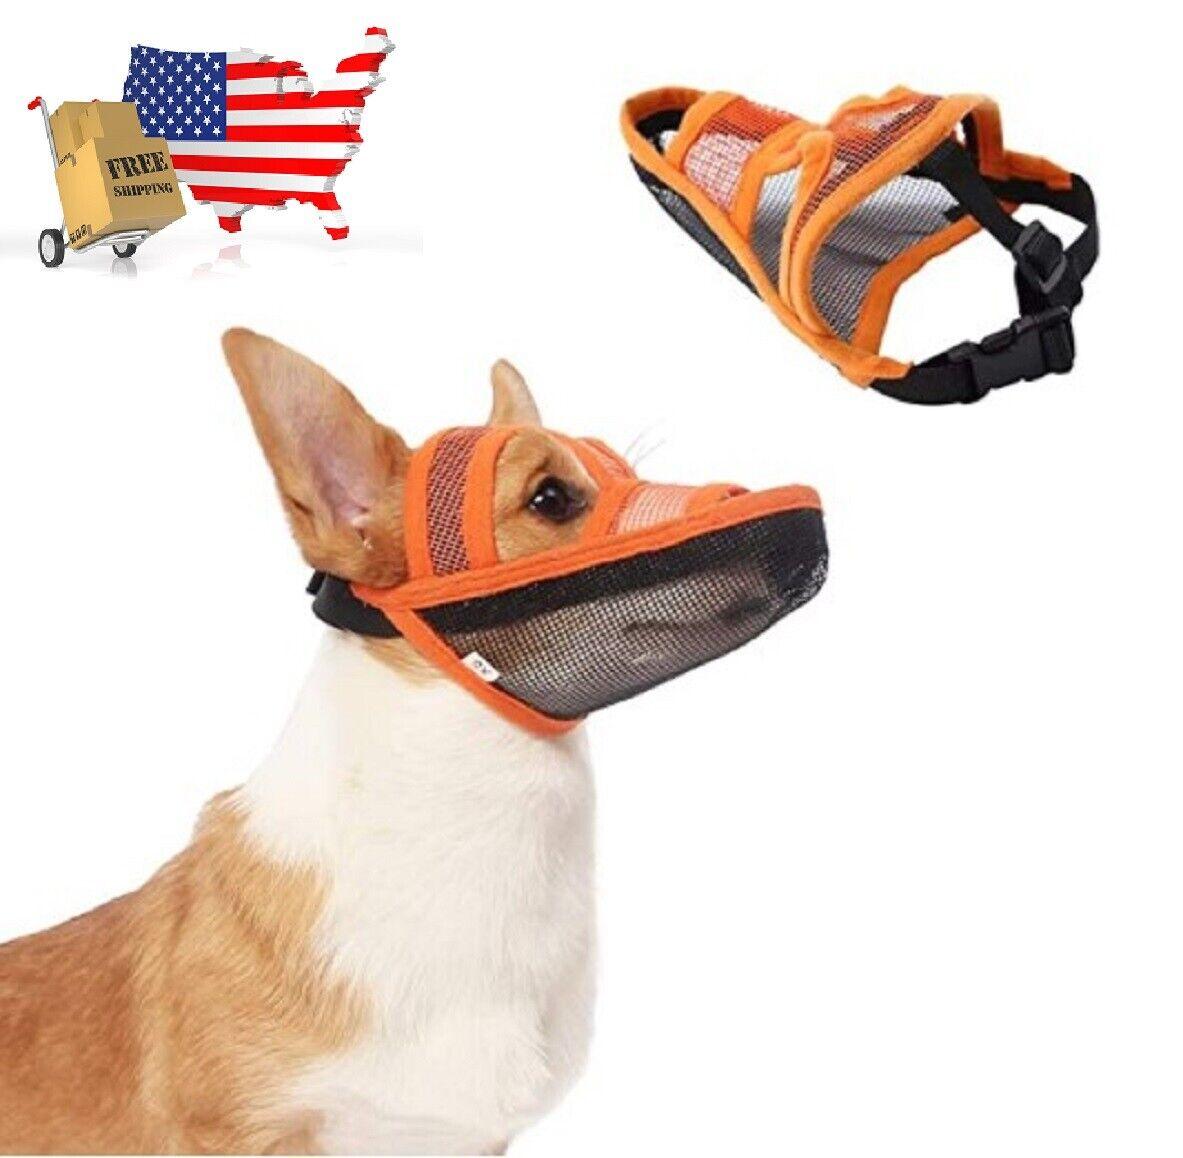 Dog Muzzle Air Mesh Breathable and Drinkable Anti-Biting Anti-Barking / Licking Dog Supplies